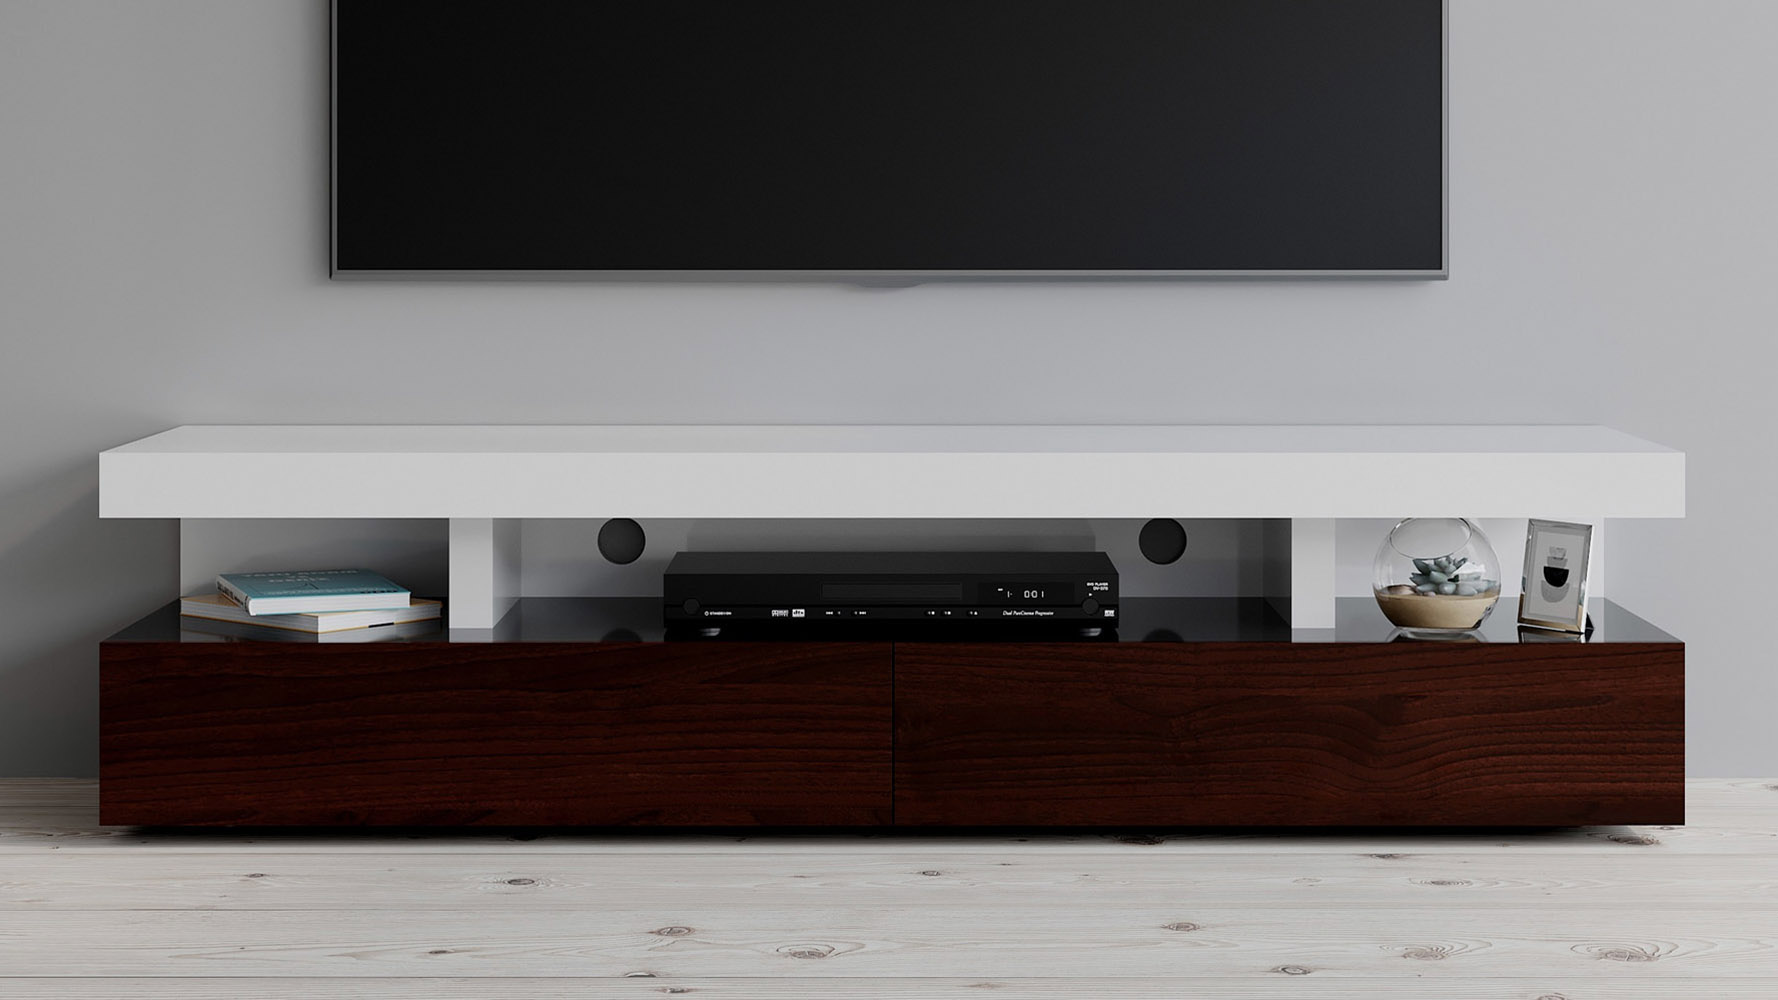 mcintosh tv stand white and ebony